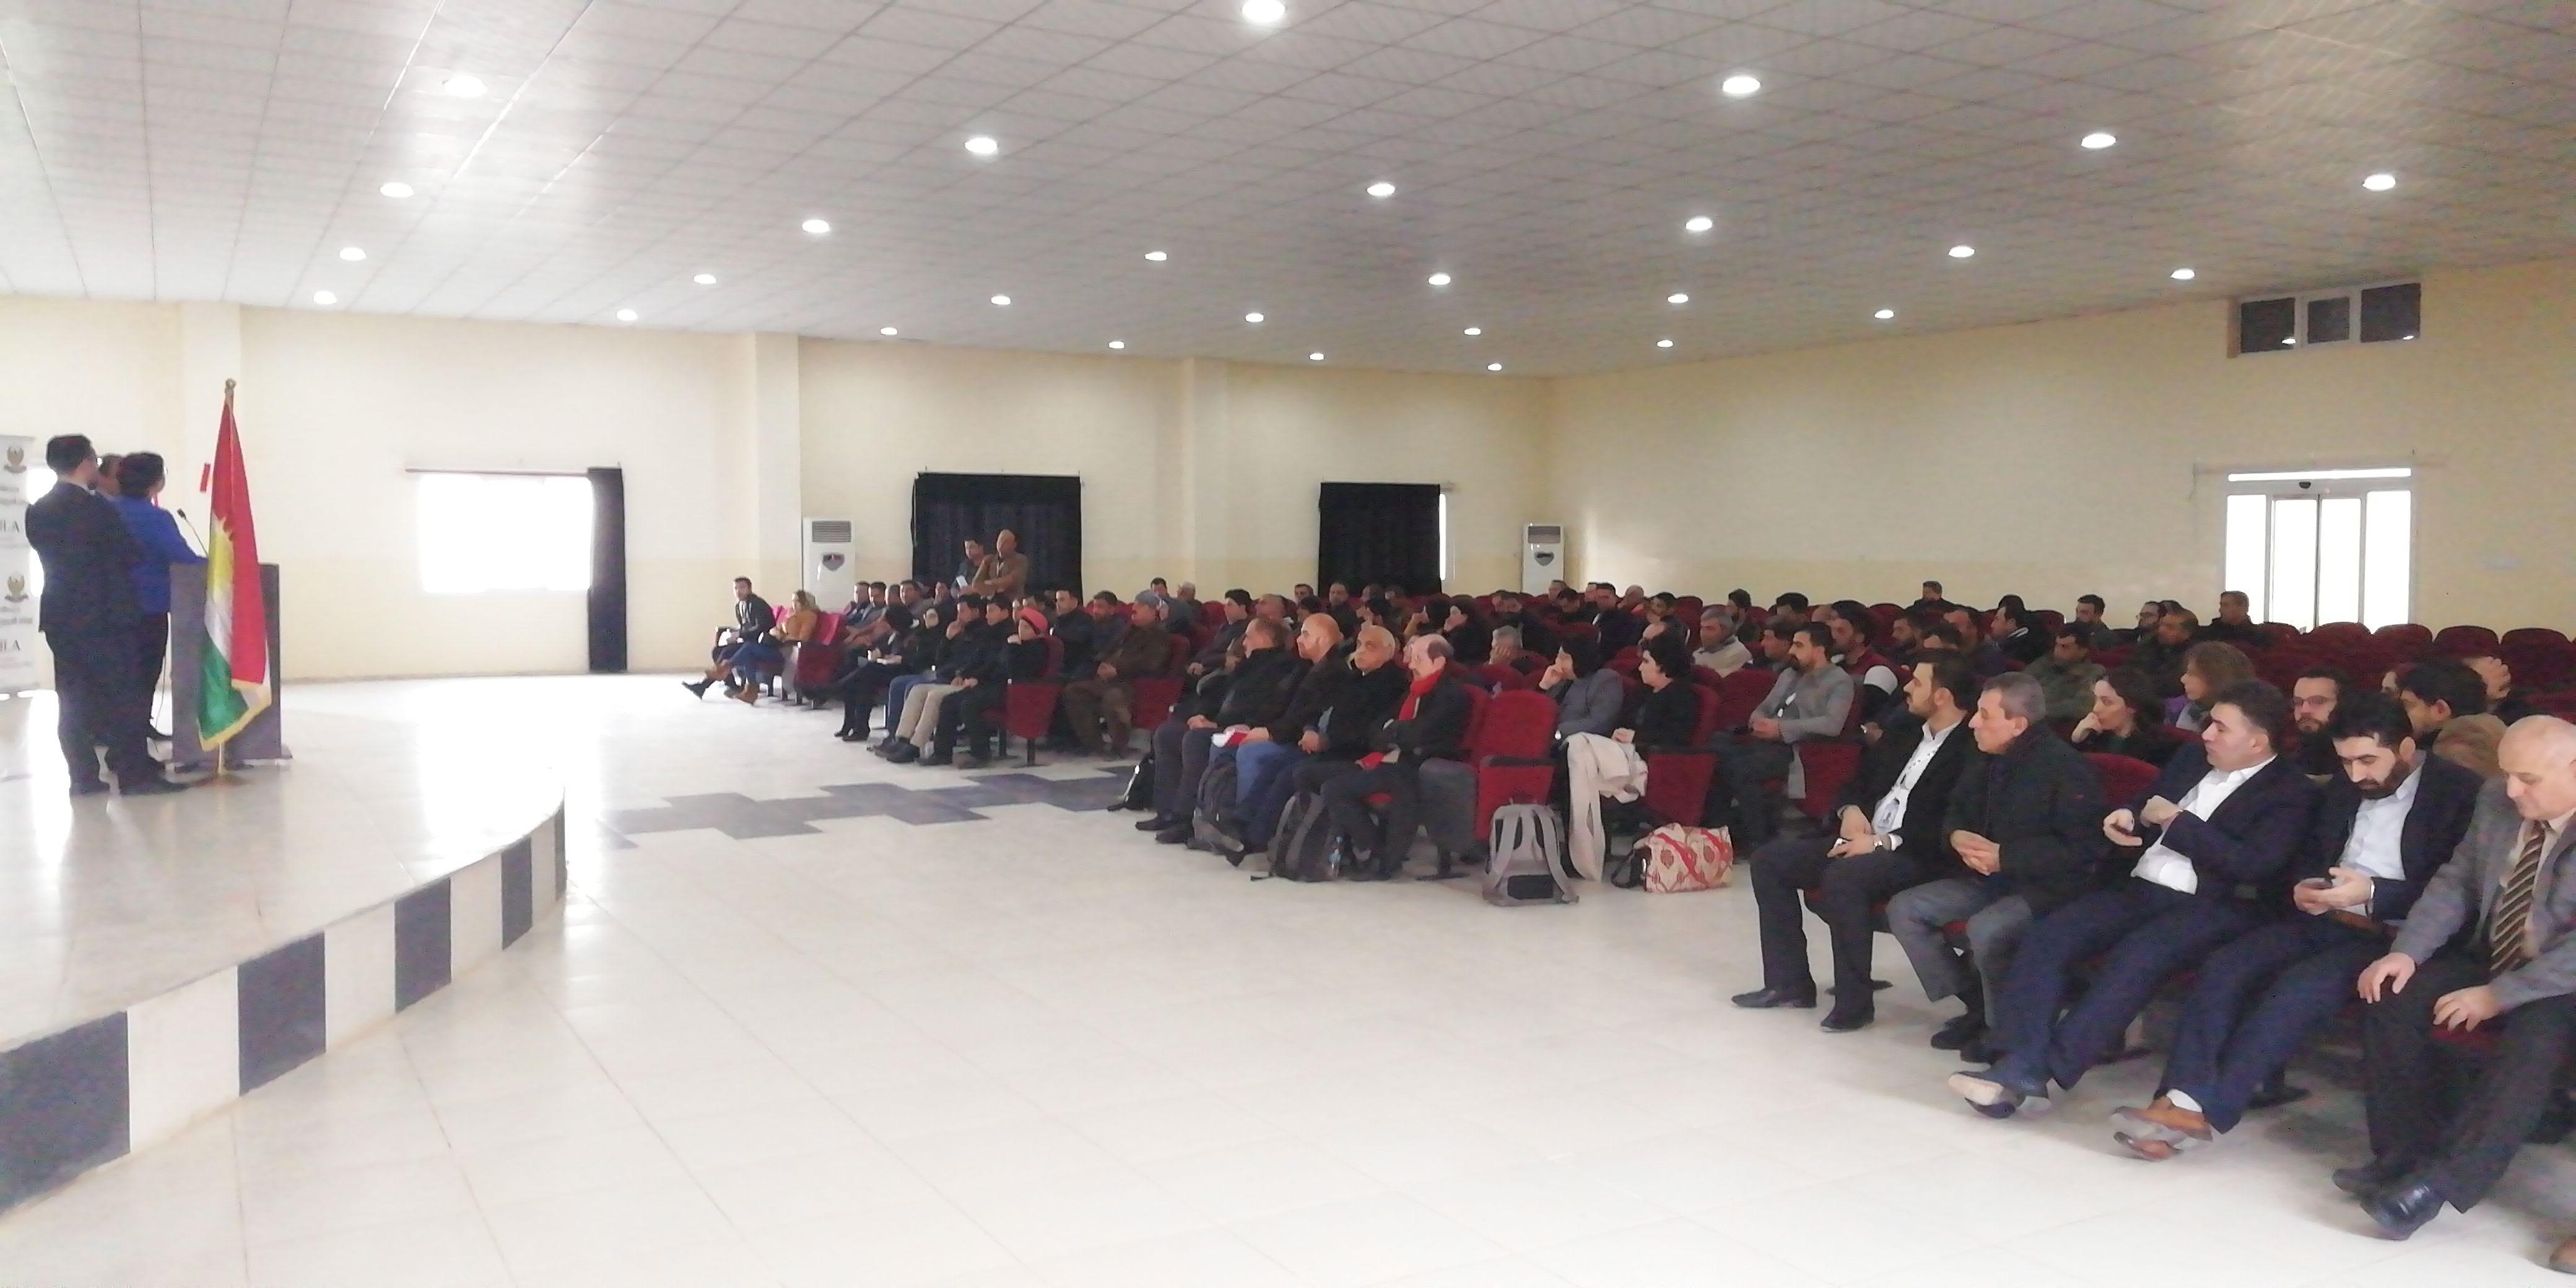 Domiz 1 Refugees Camp session- R-SOS Units opening // Duhok (Iraq) - 15 January 2019R-